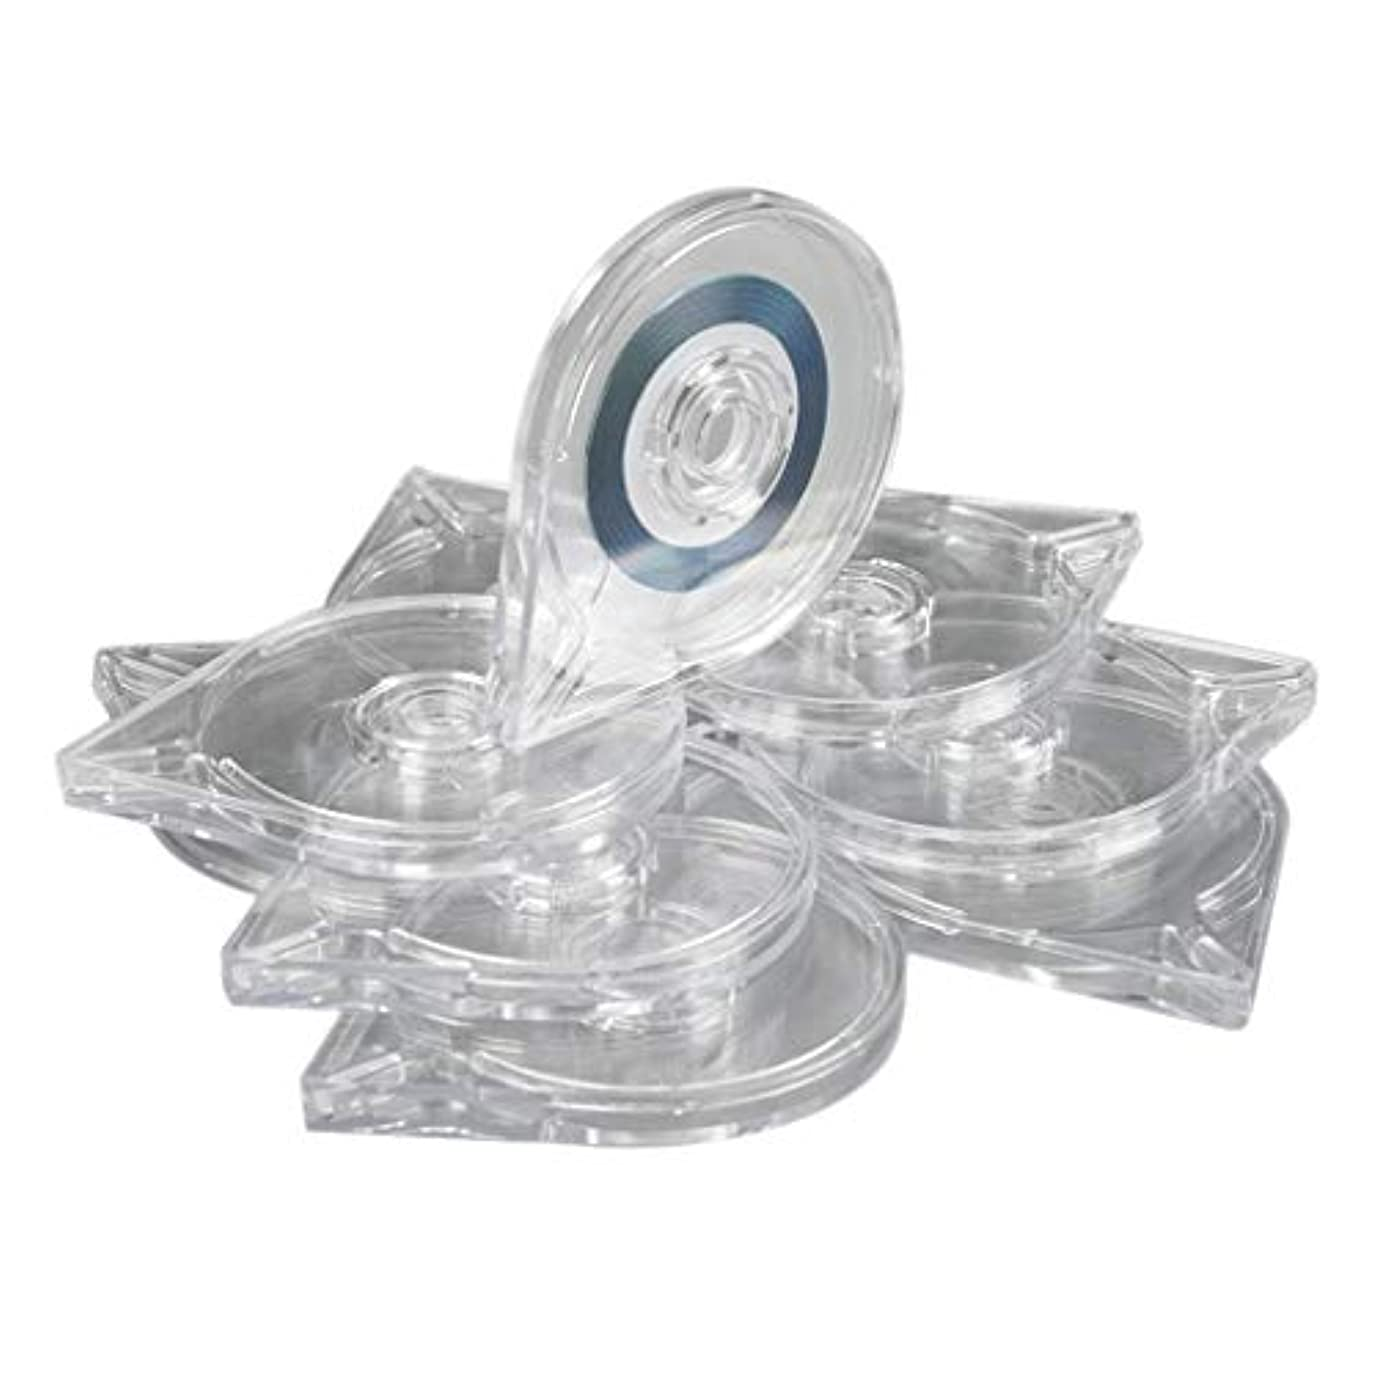 B Blesiya 10本 ネイルアートツール ストライピングテープラインケース ボックス プラスチック マニキュア